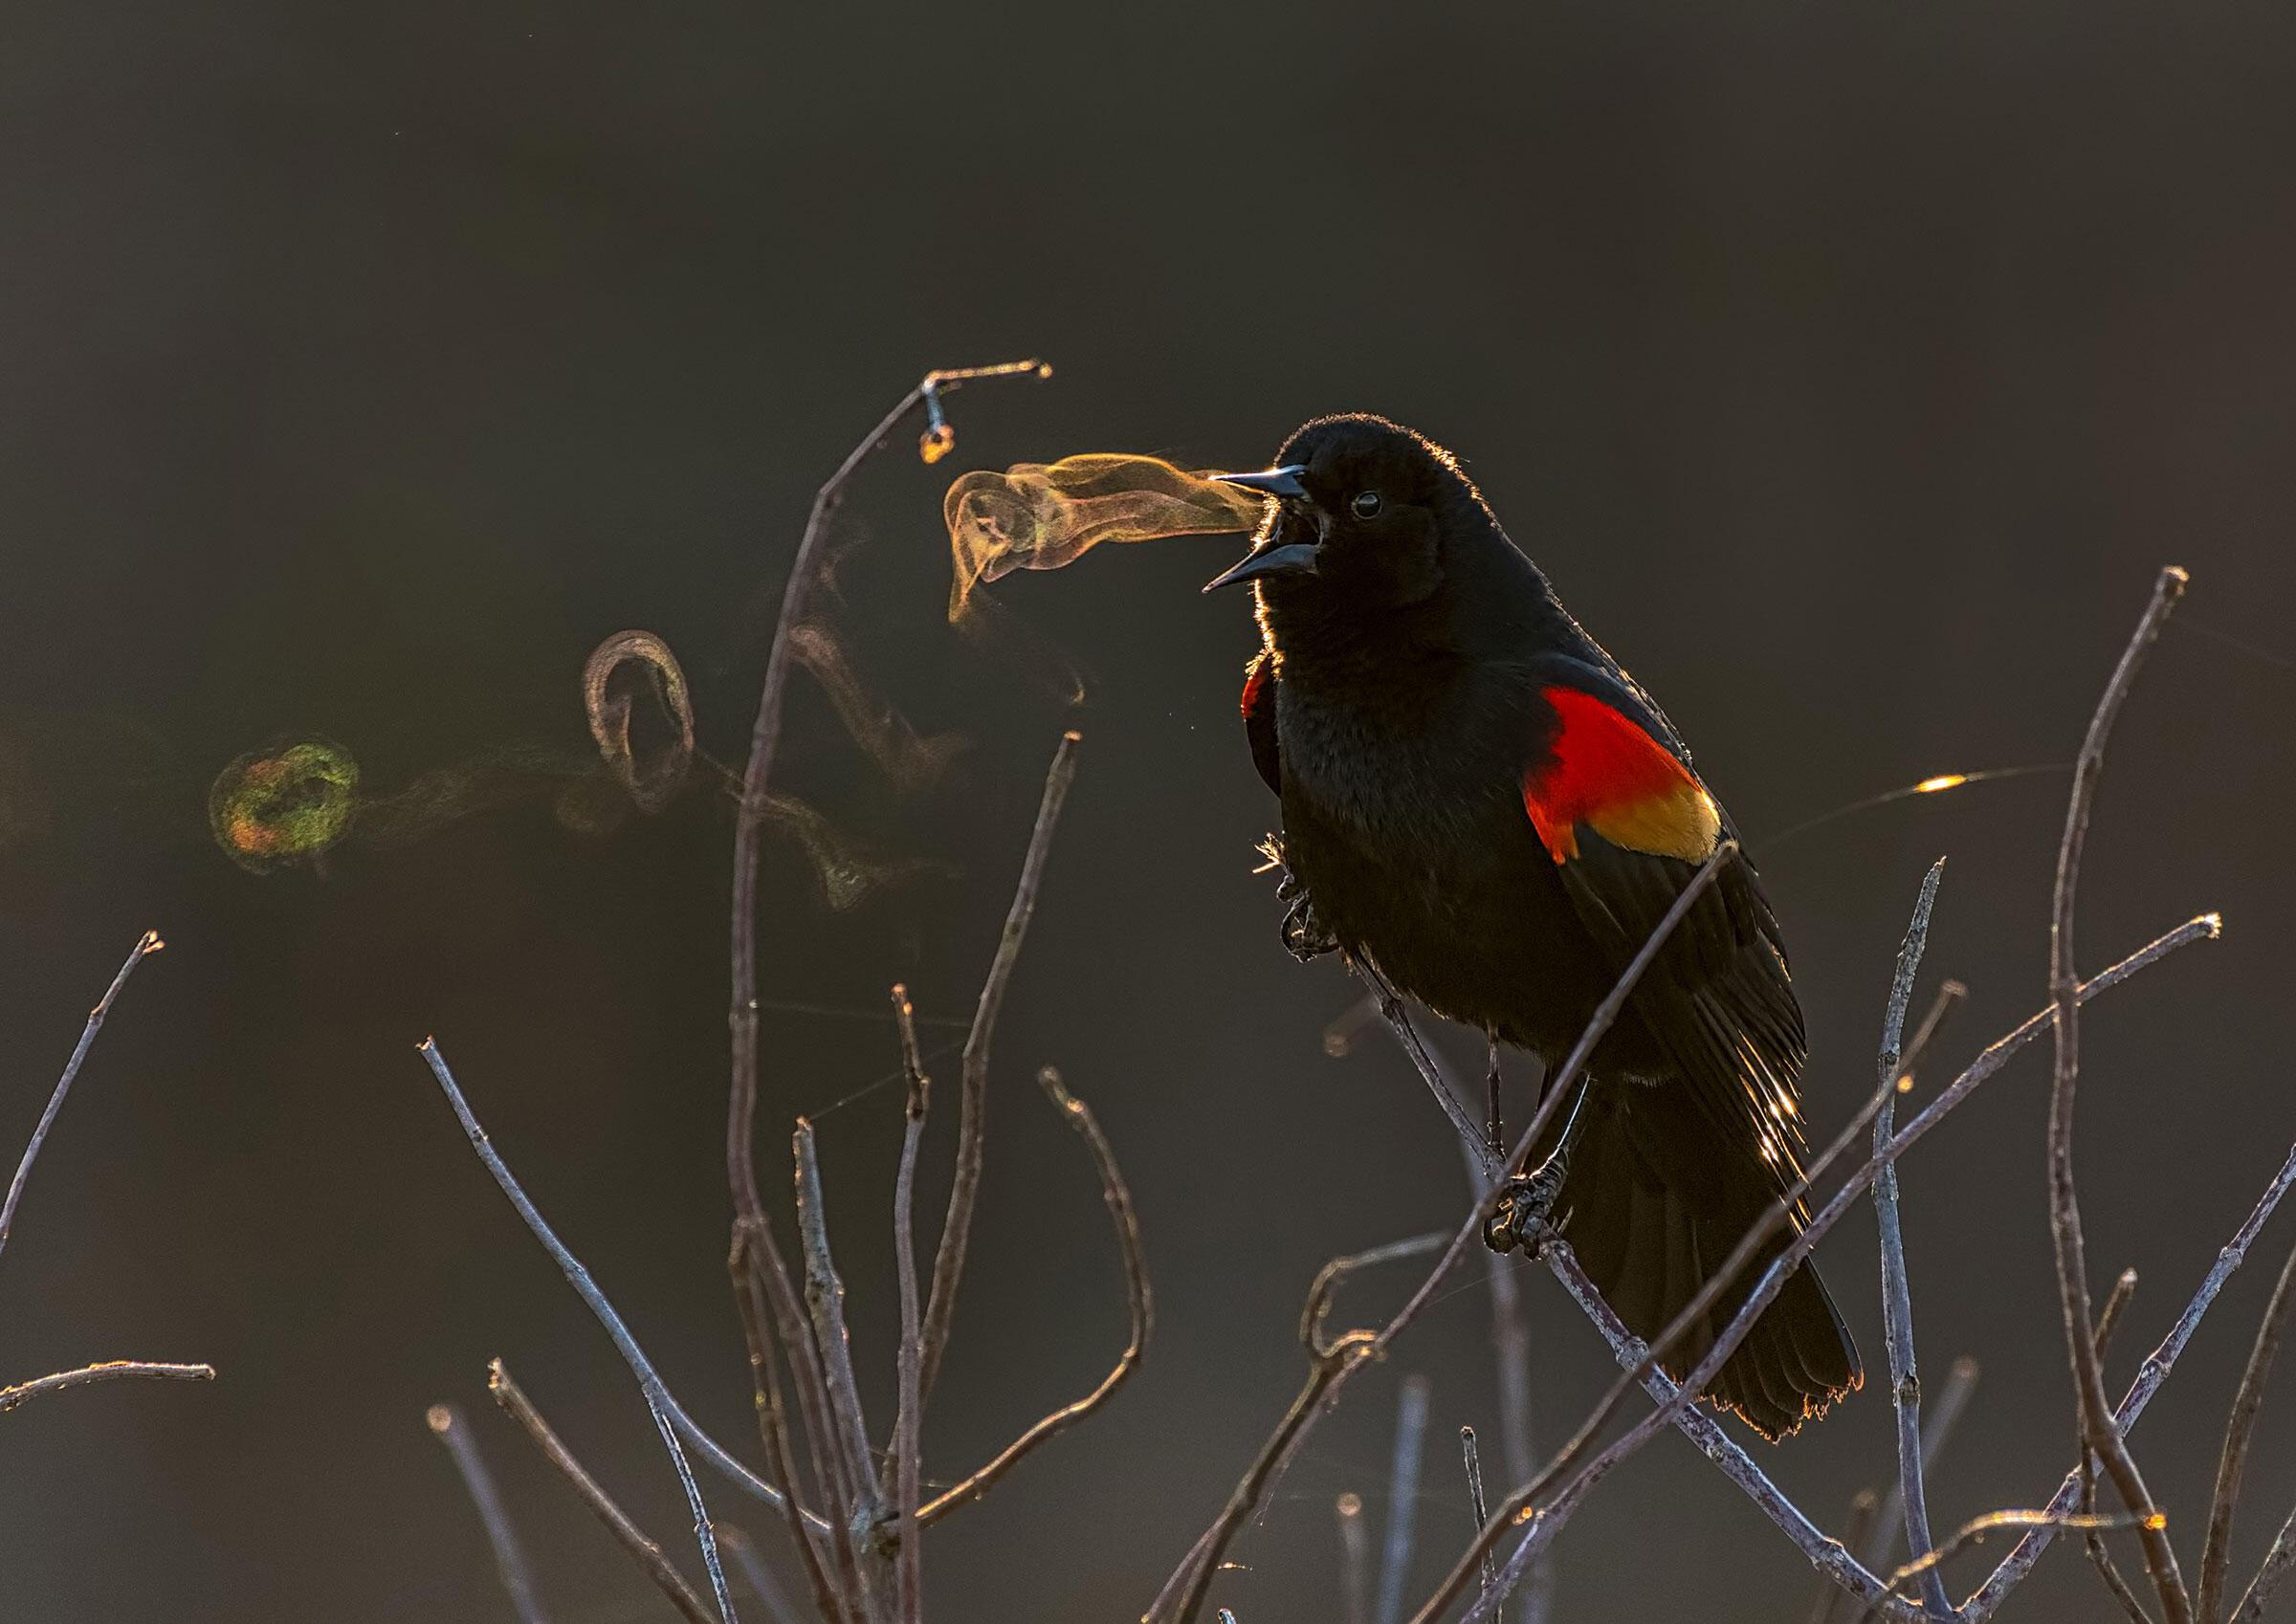 Red-winged Blackbird. Kathrin Swoboda/Audubon Photography Awards